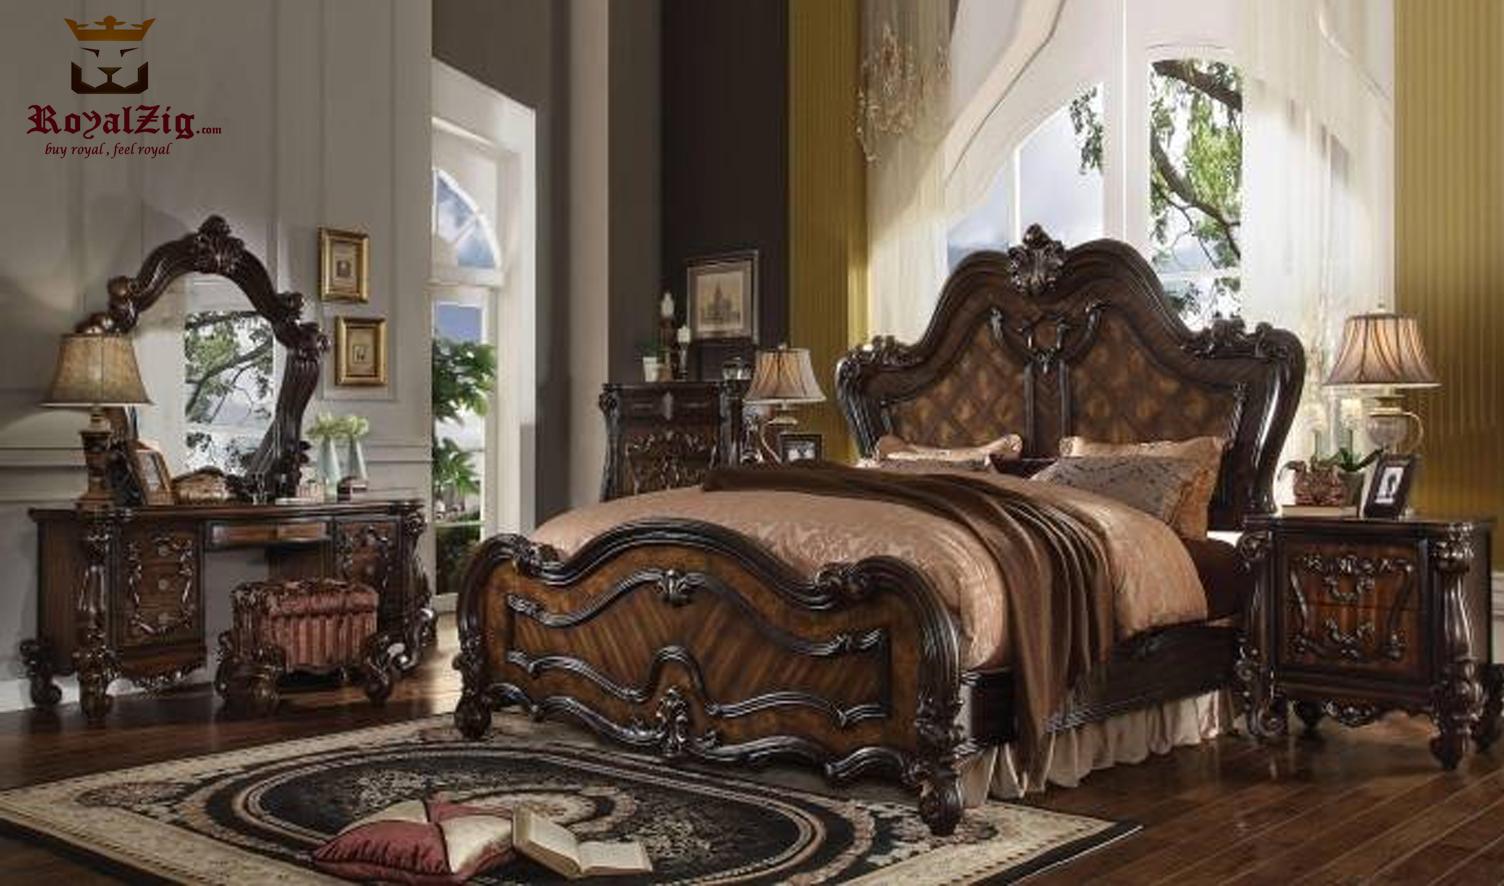 San Antonio Antique Style King Size High Headboard Bedroom Set